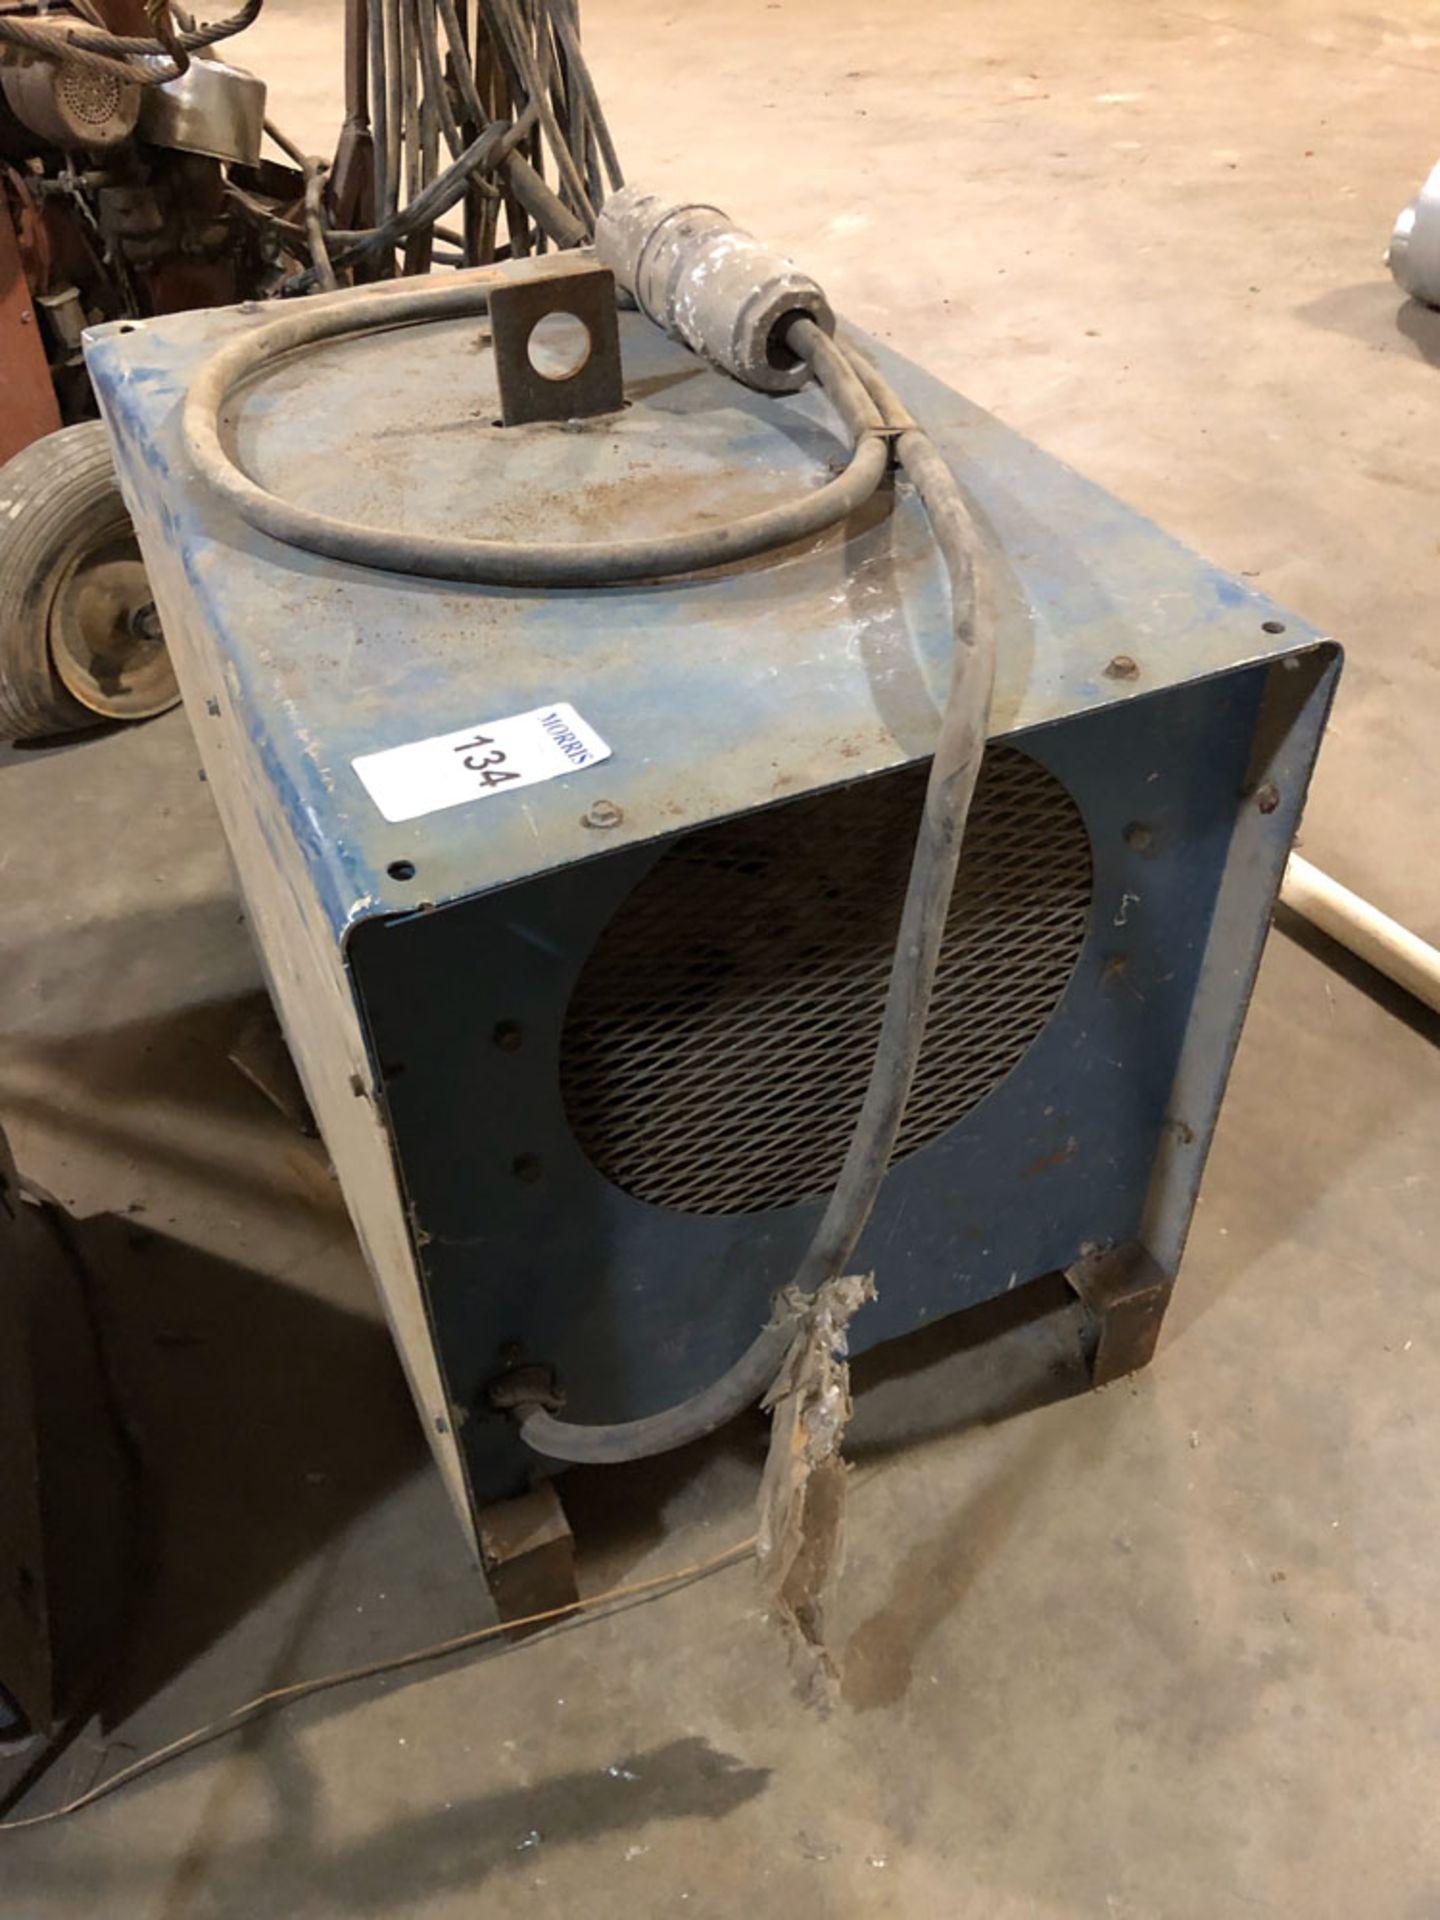 Lot 134 - Welder, Miller Dialarc 250 AC/DC